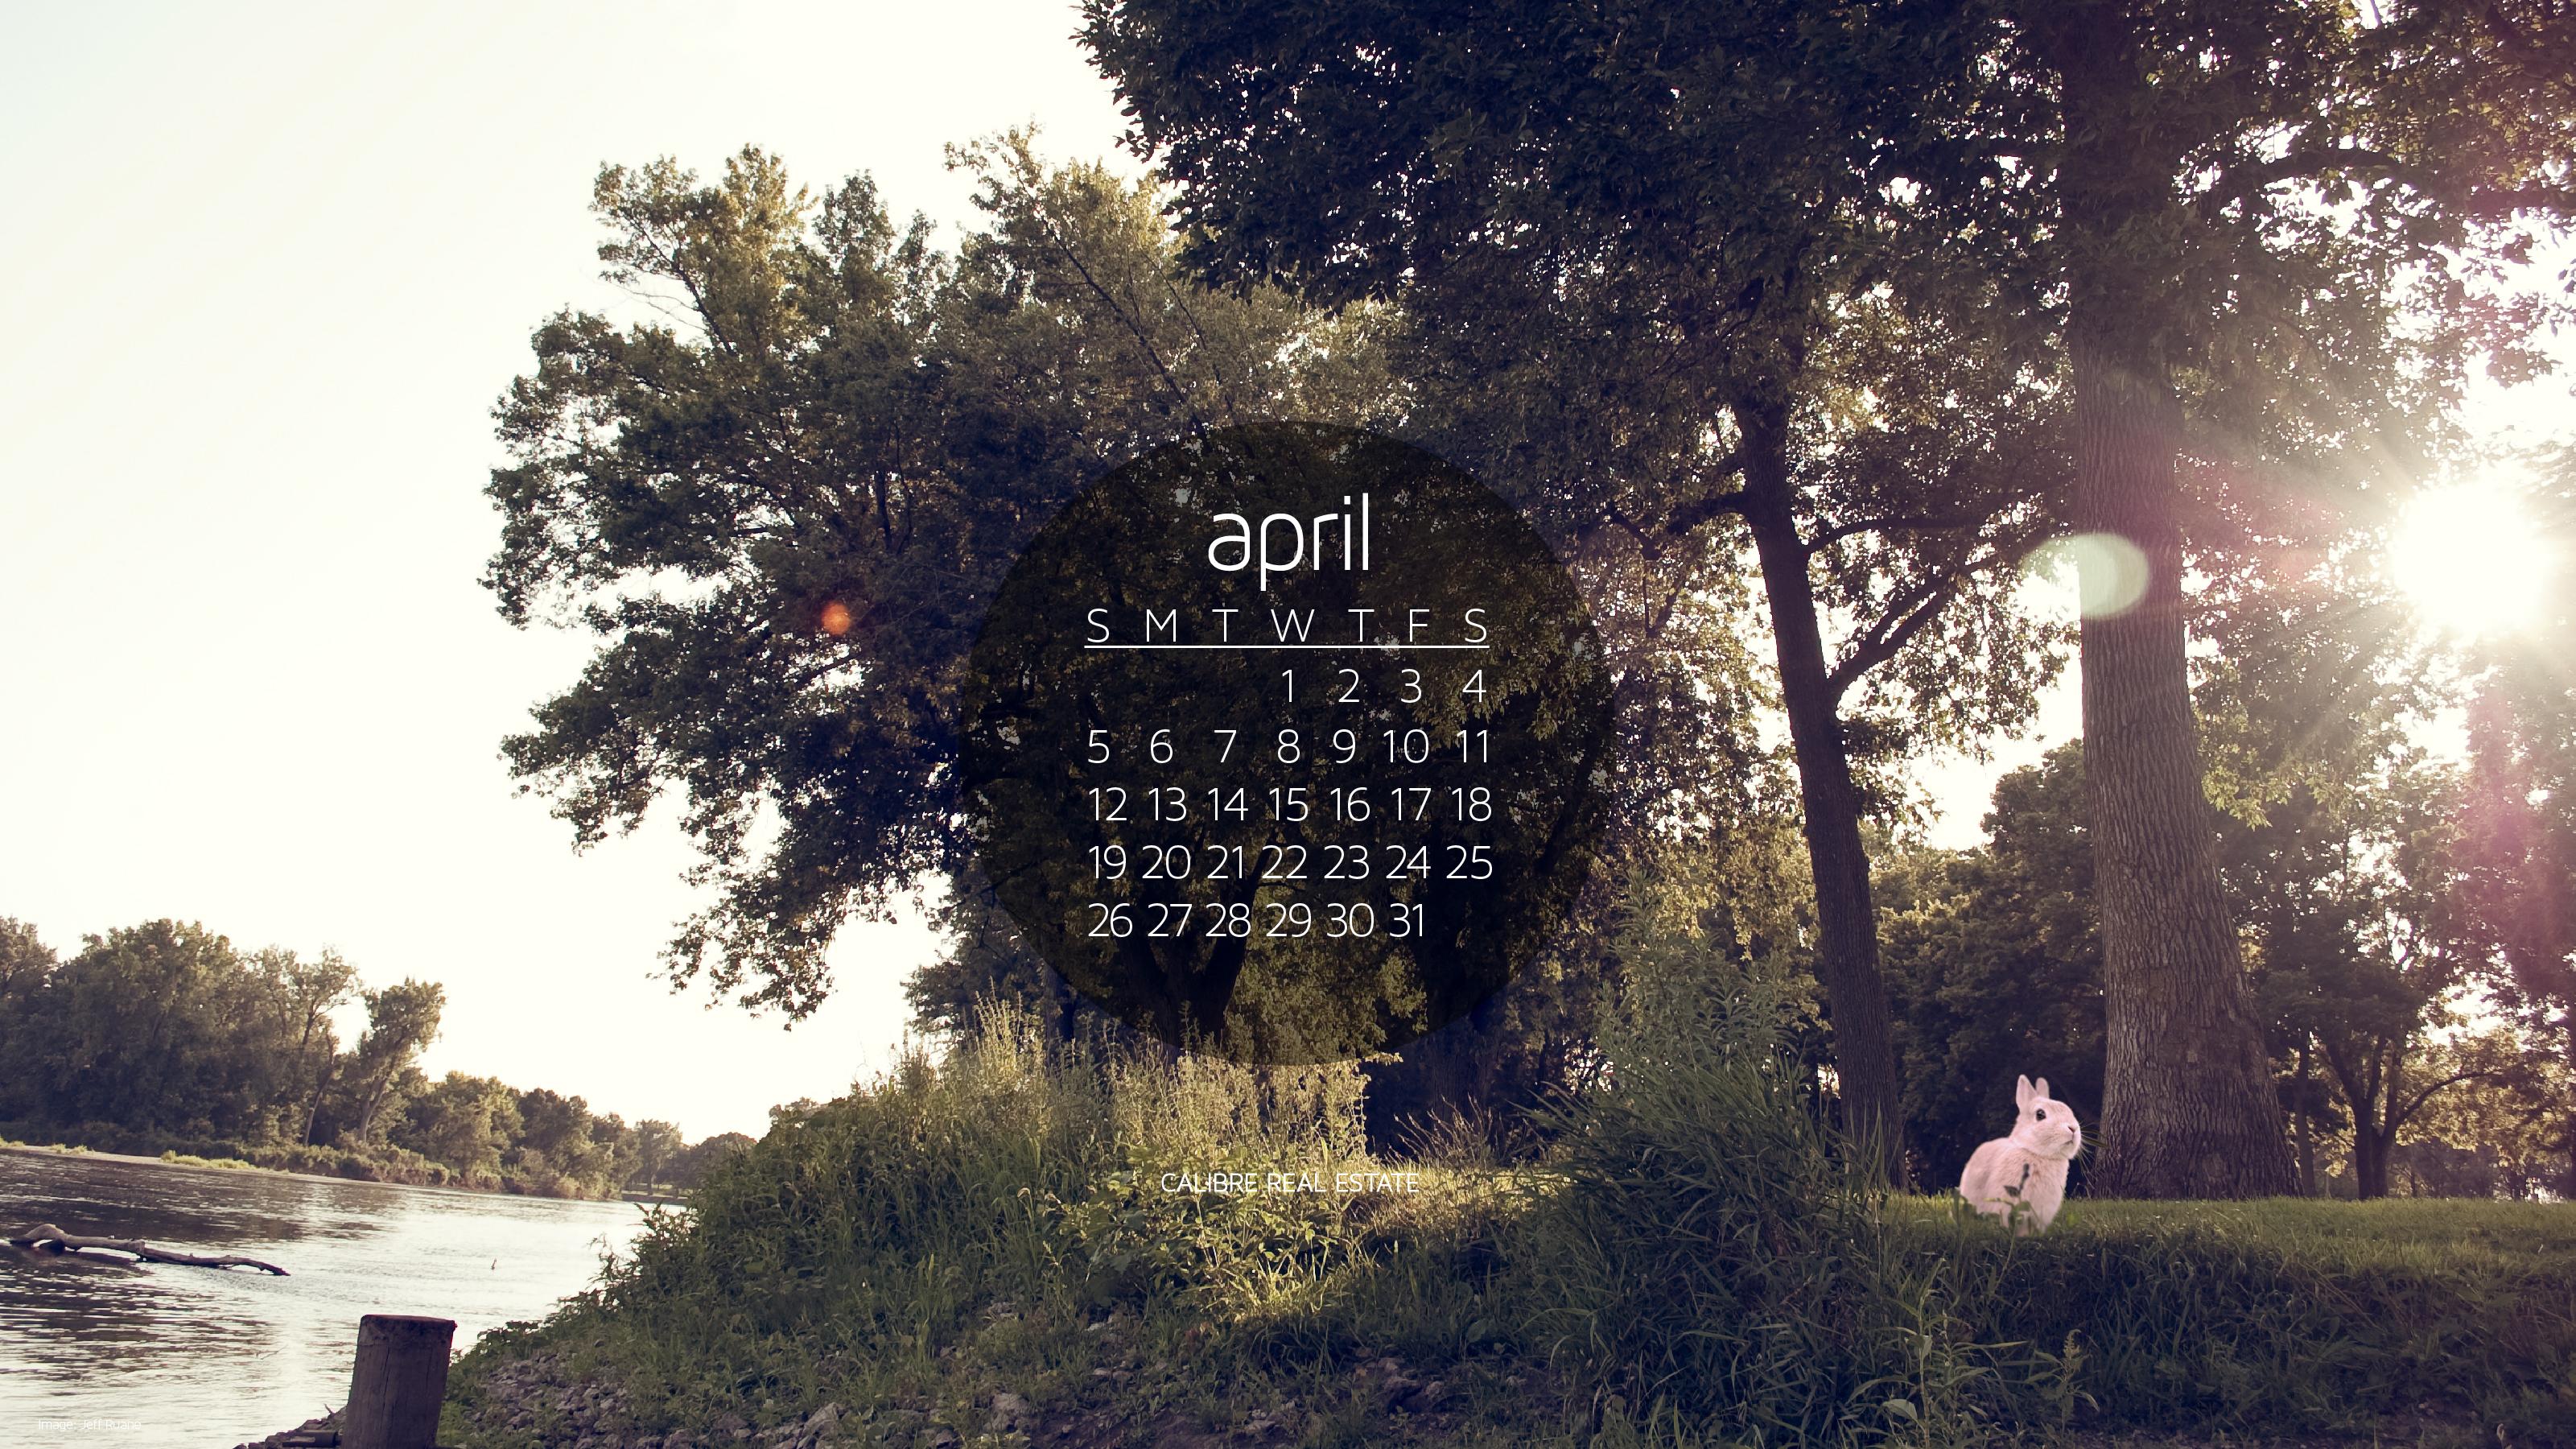 Calendar On Wallpaper Mac : January calendar downloadable mac search results